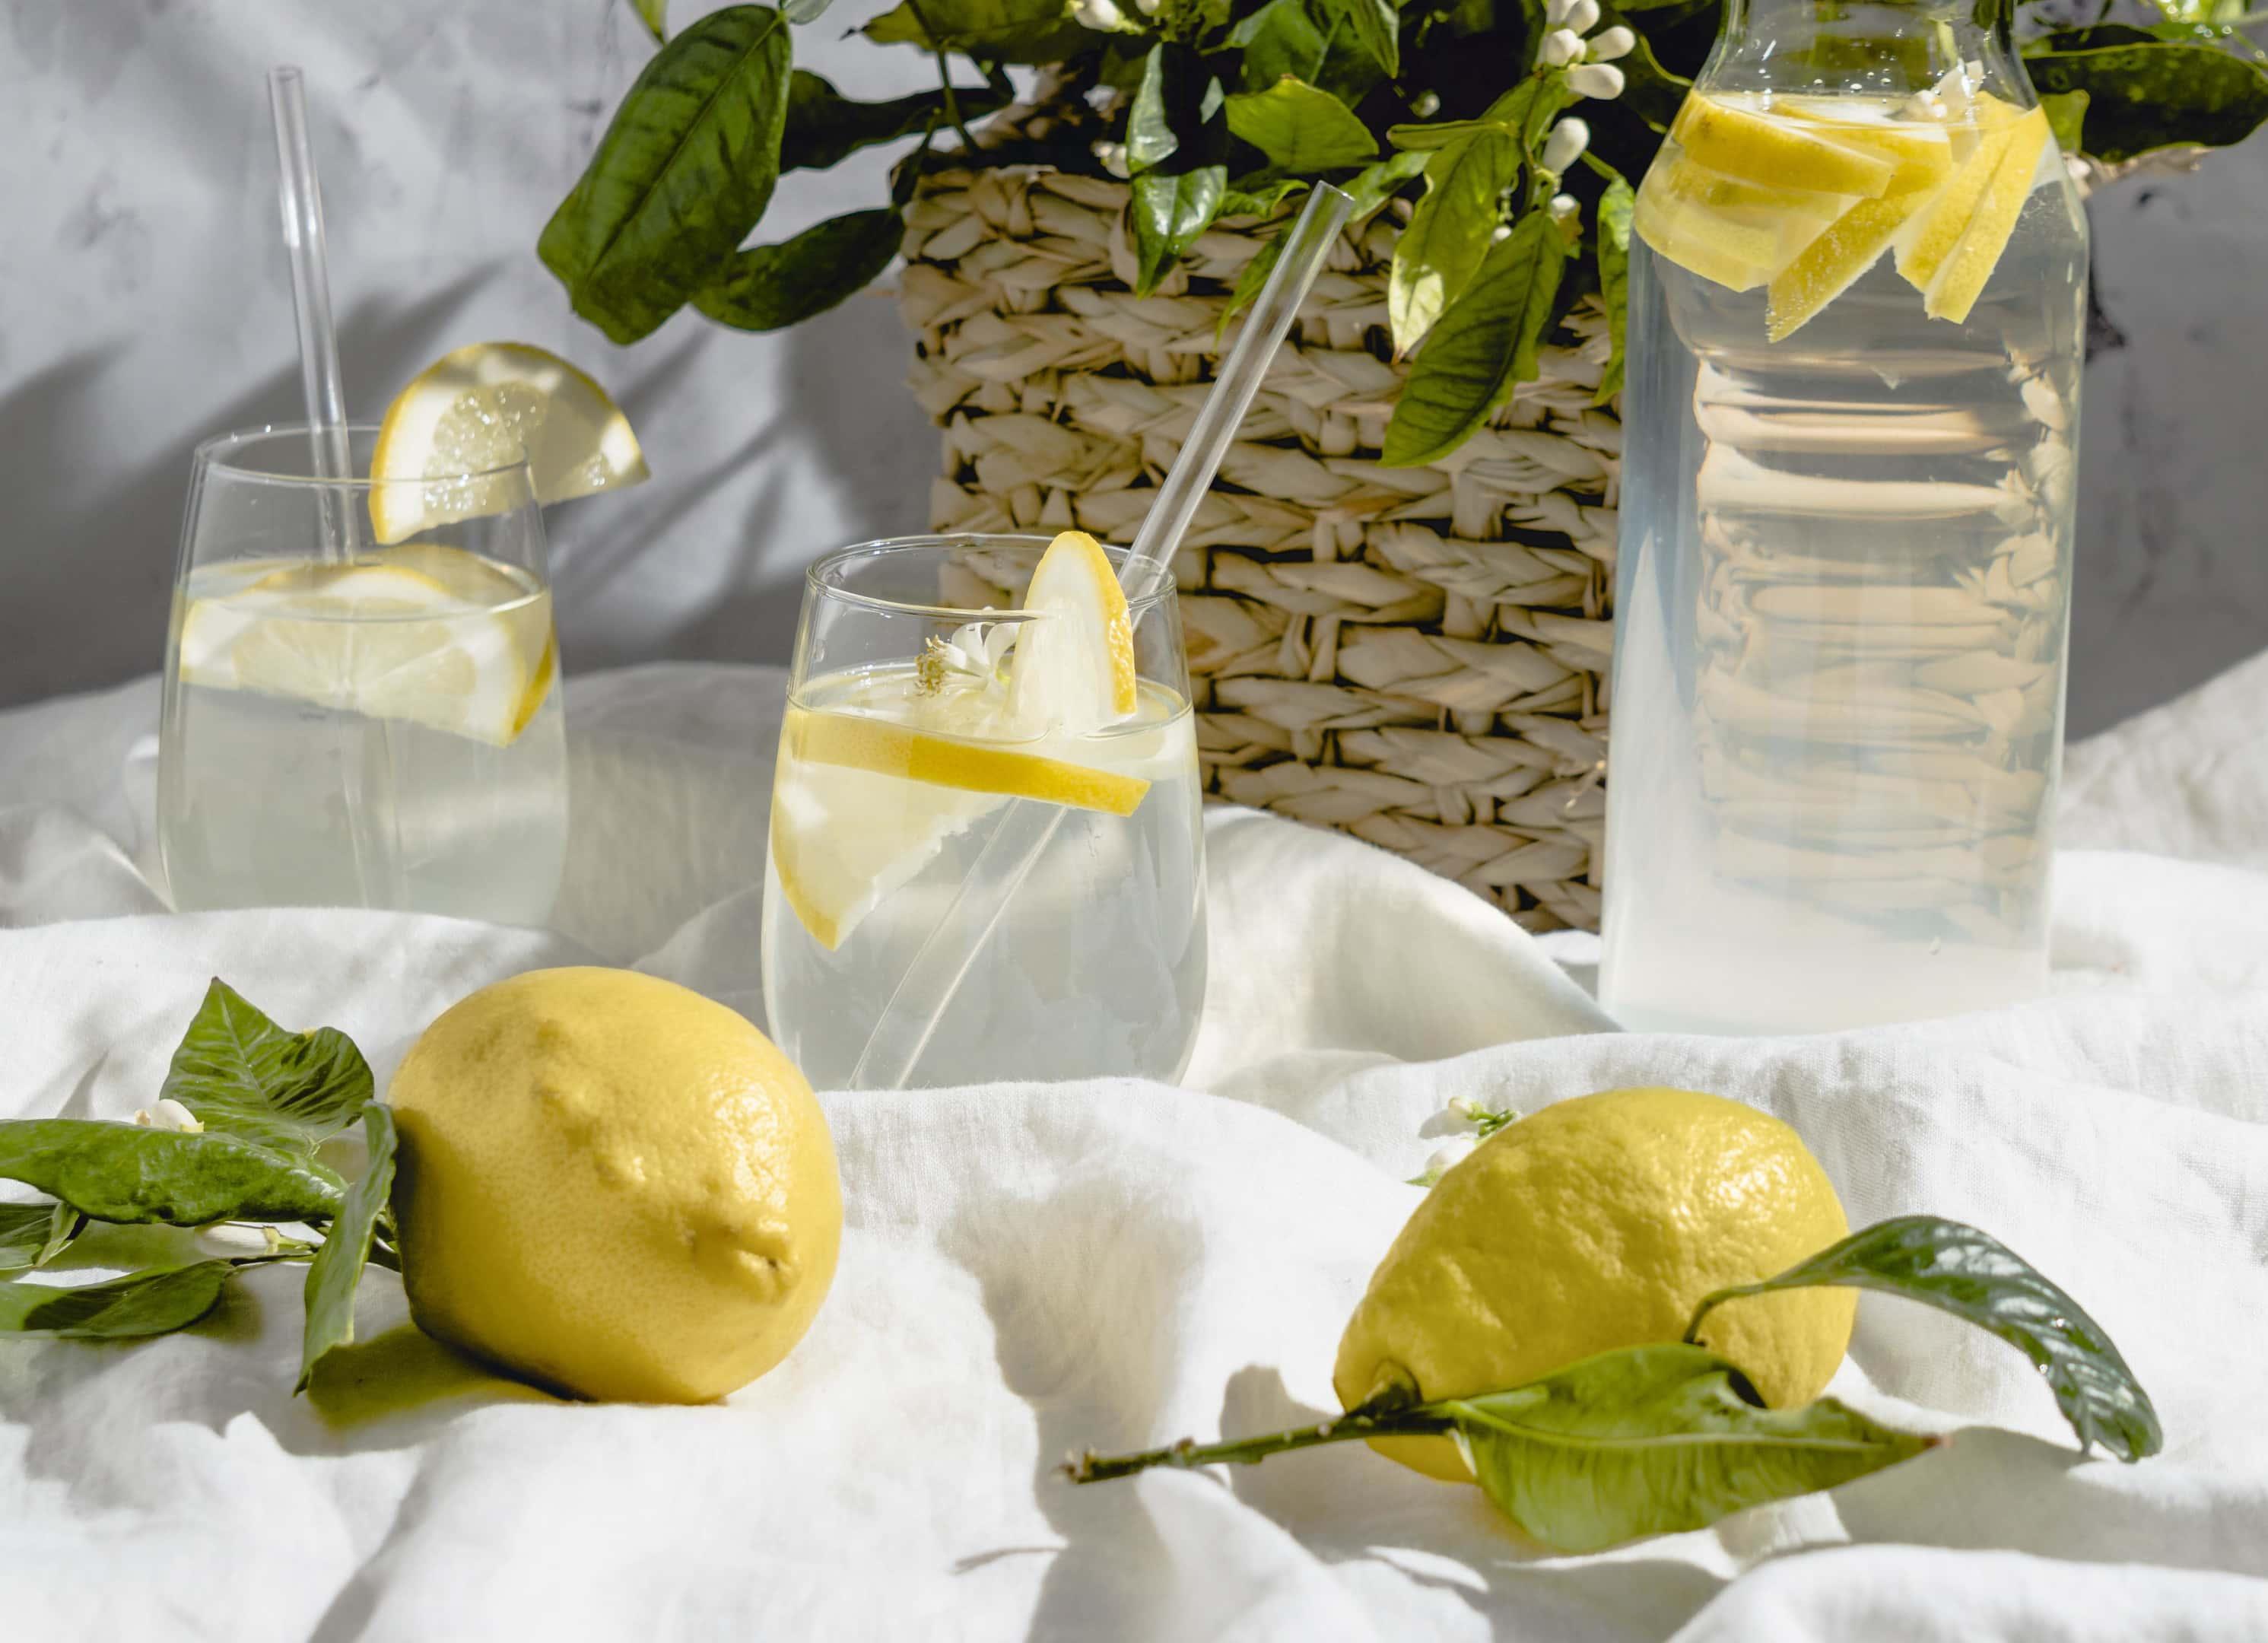 Fresh lemonade with ripe lemons